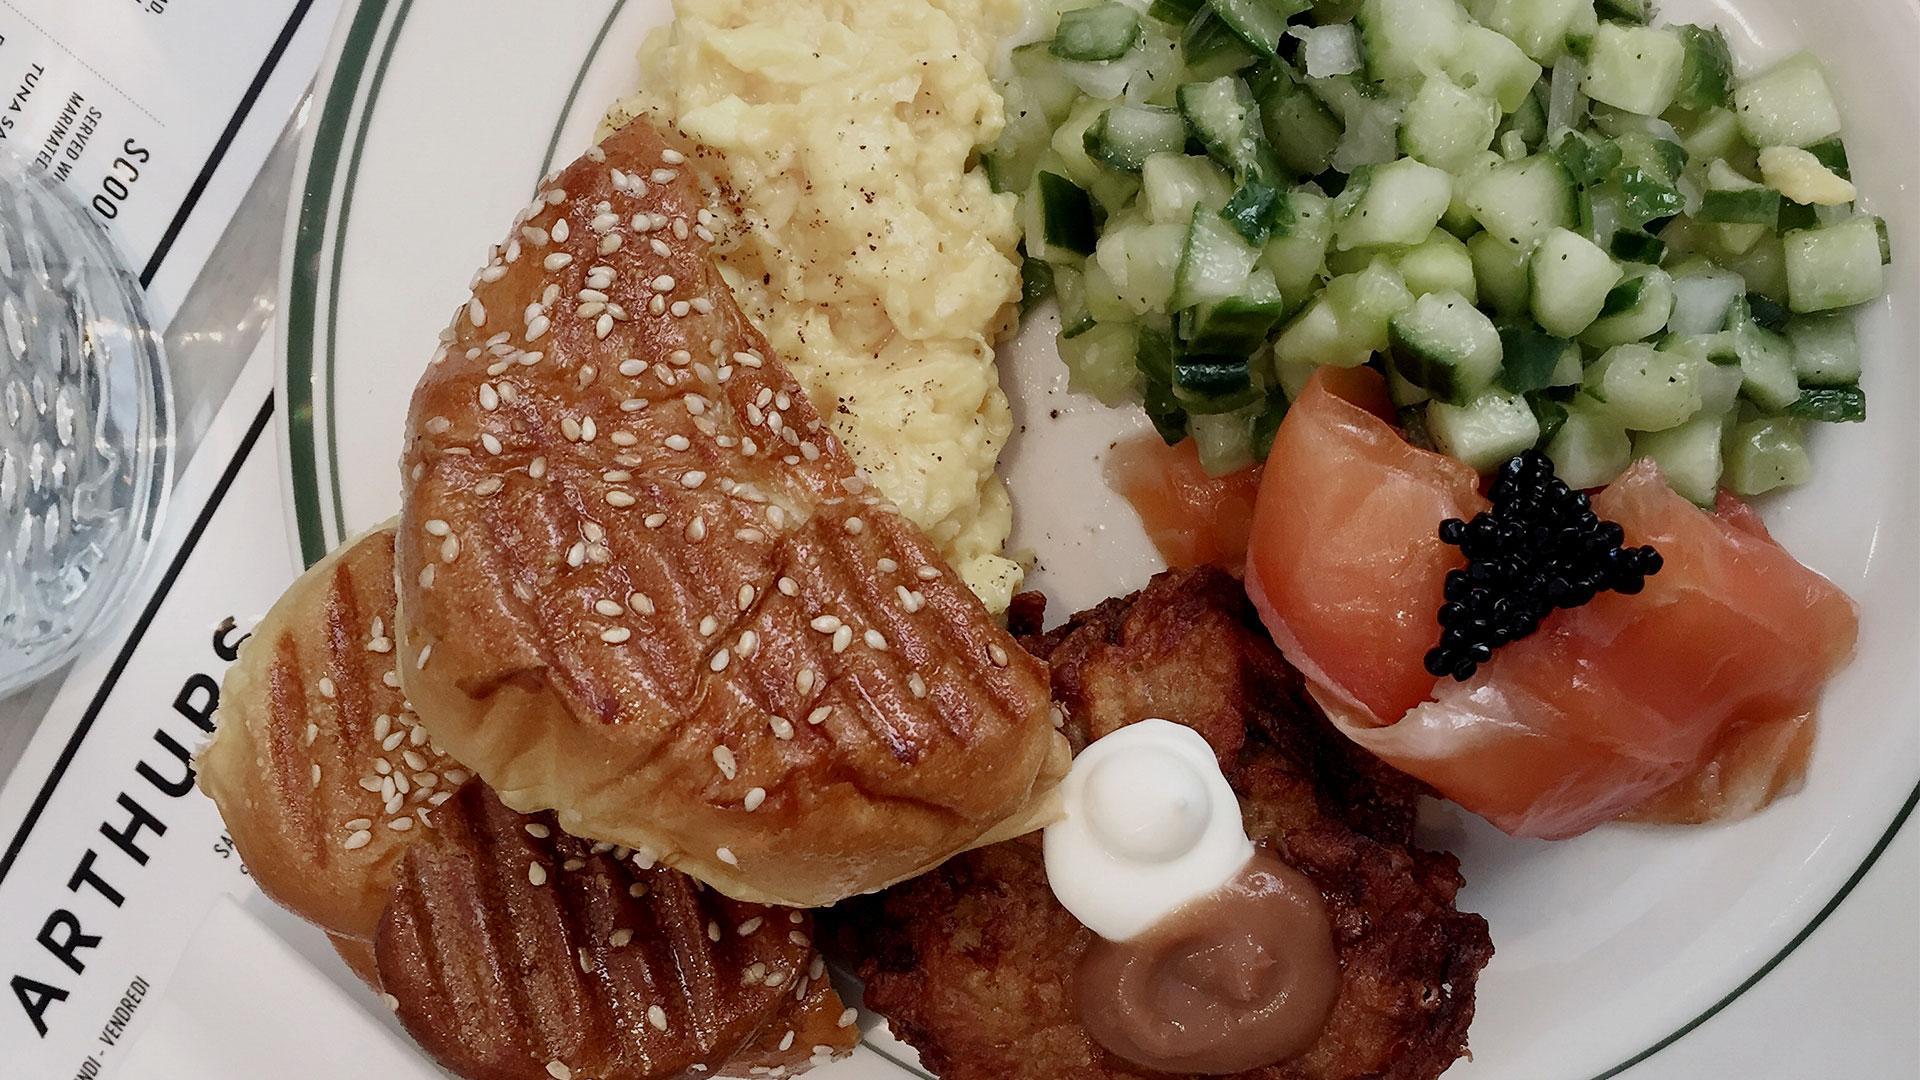 montrealista-plaisirs-de-la-table-burger